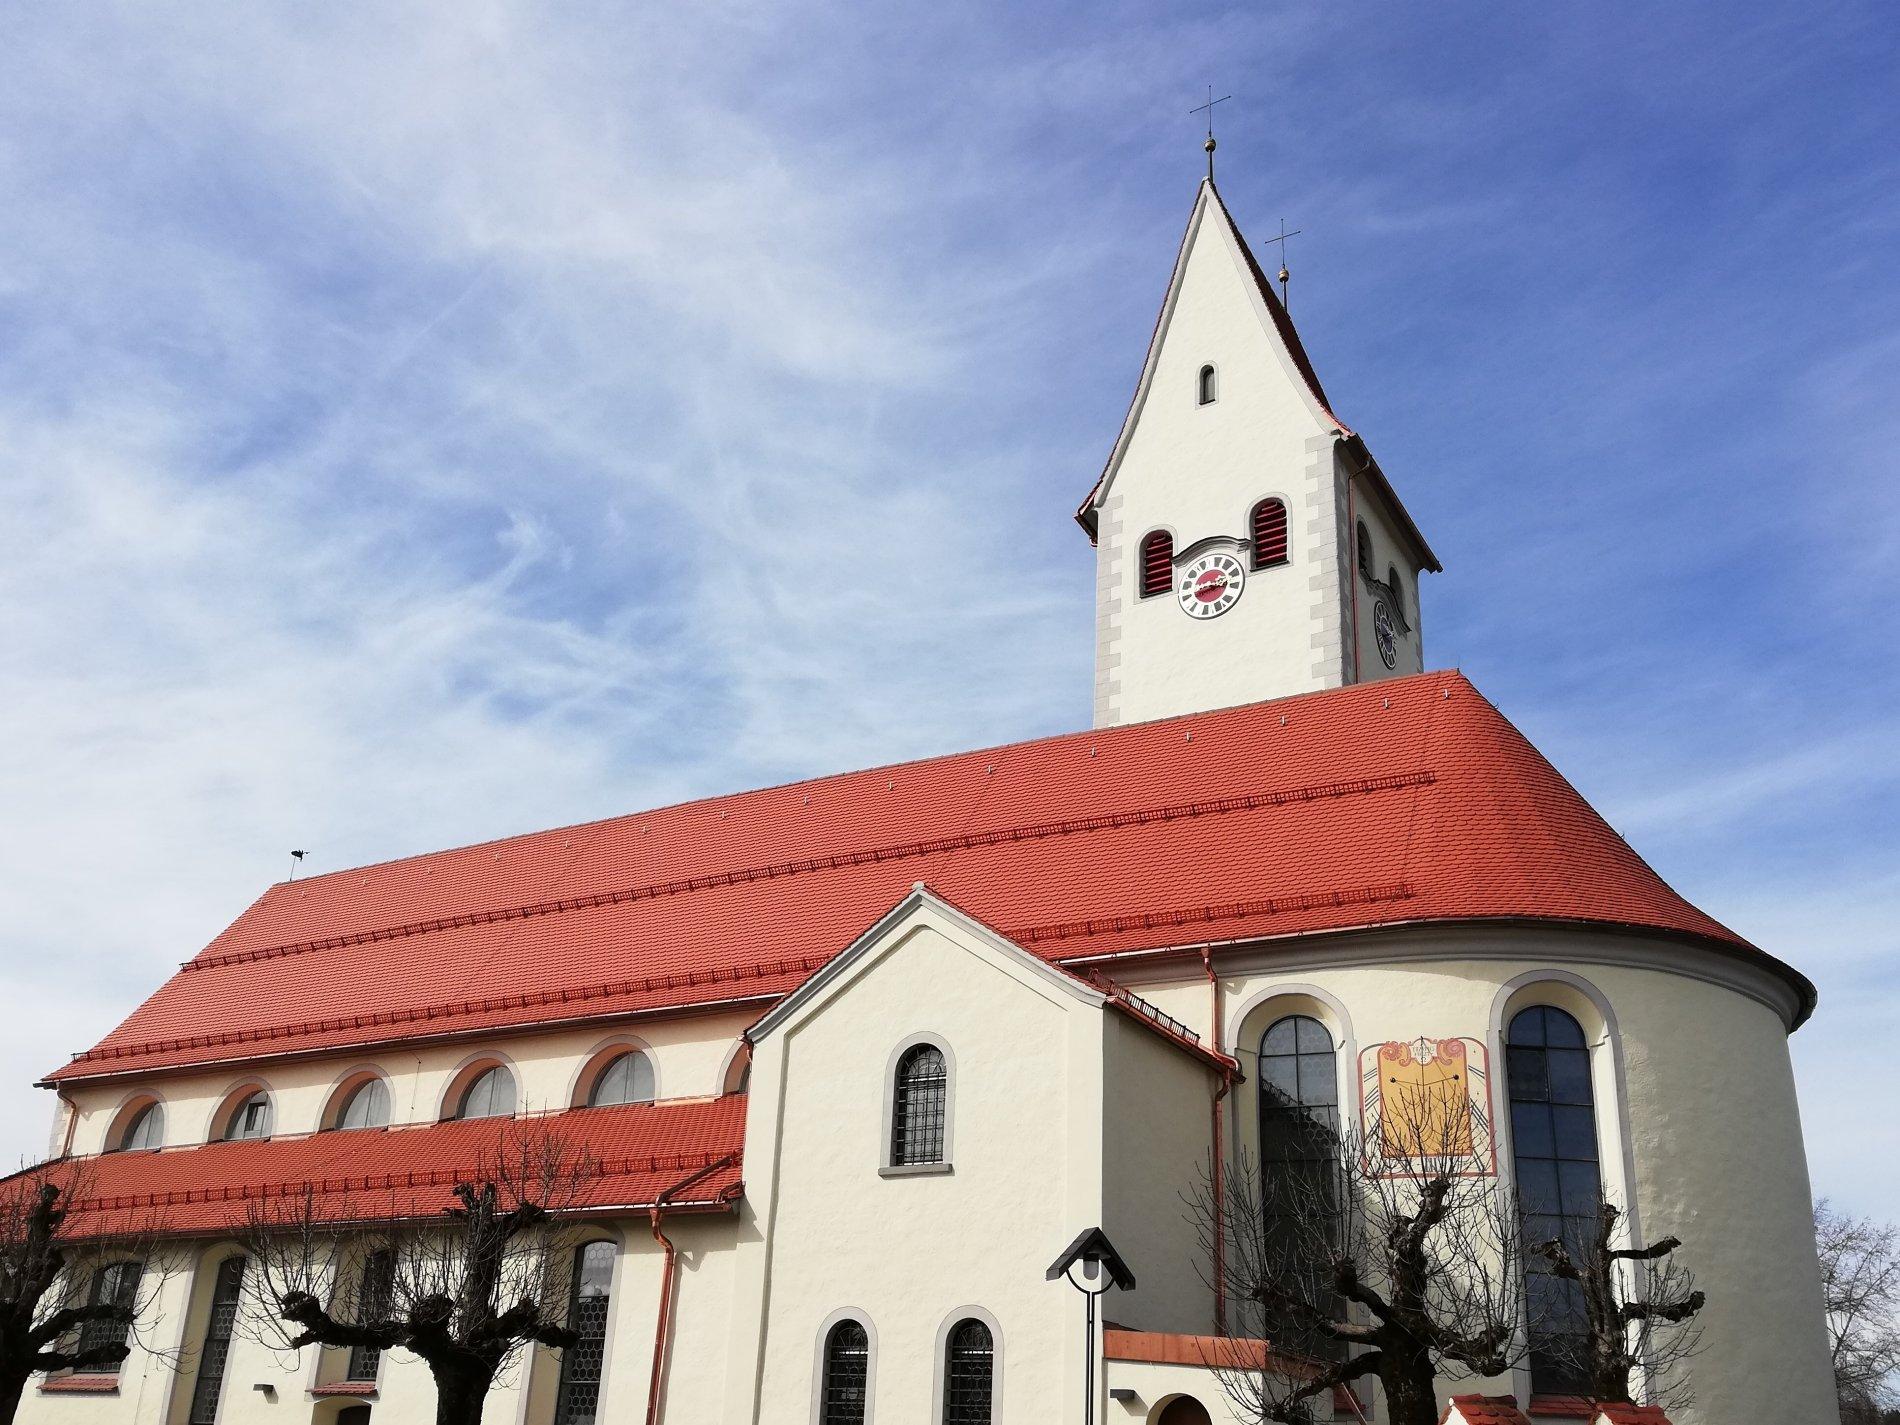 St. Johannes + St. Mauritius